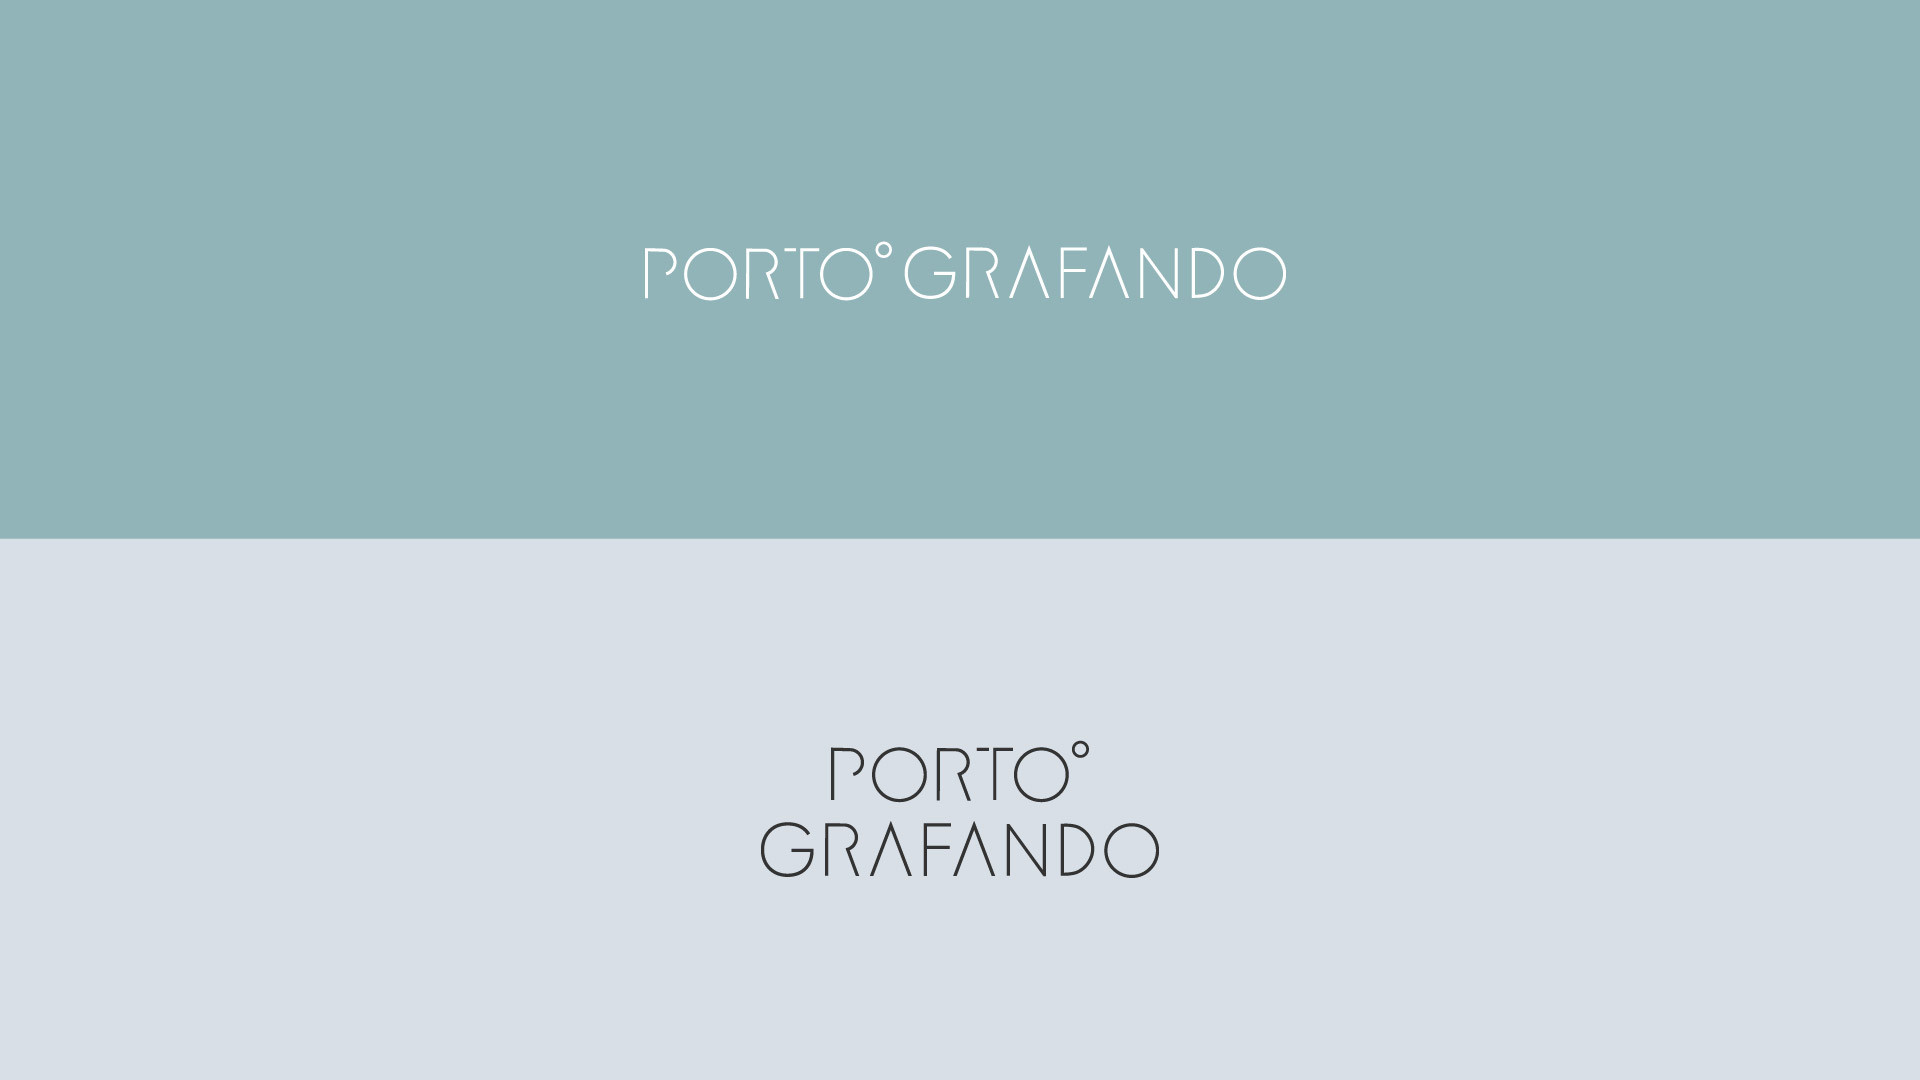 Portografando - Mockups (site)_10.jpg